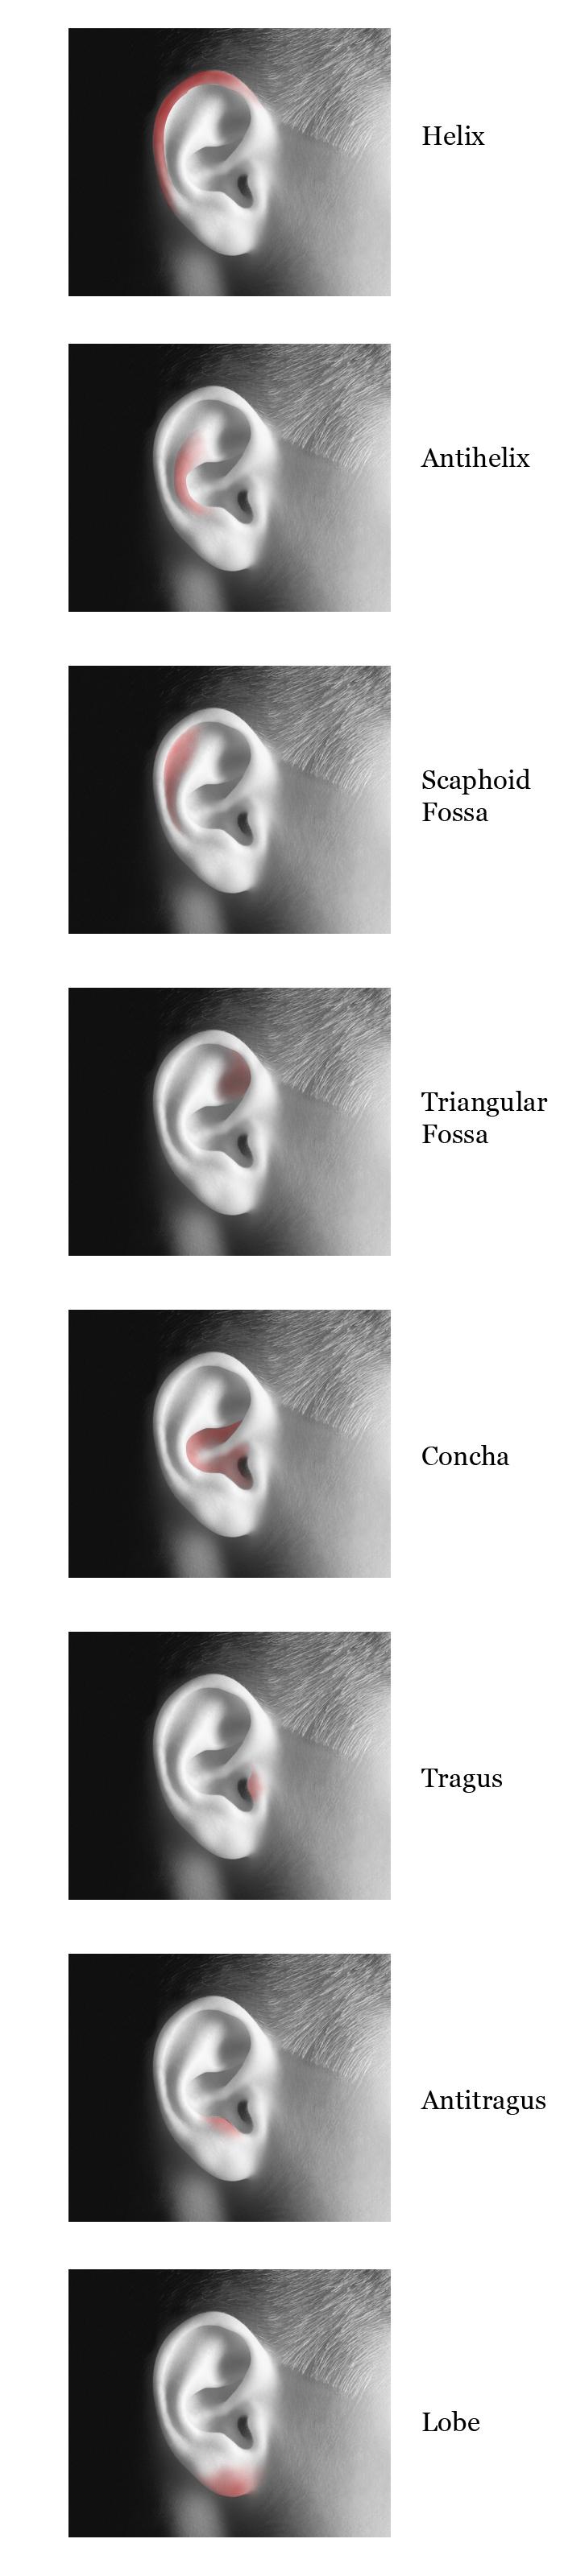 external ear anatomy at Anatomy and Art